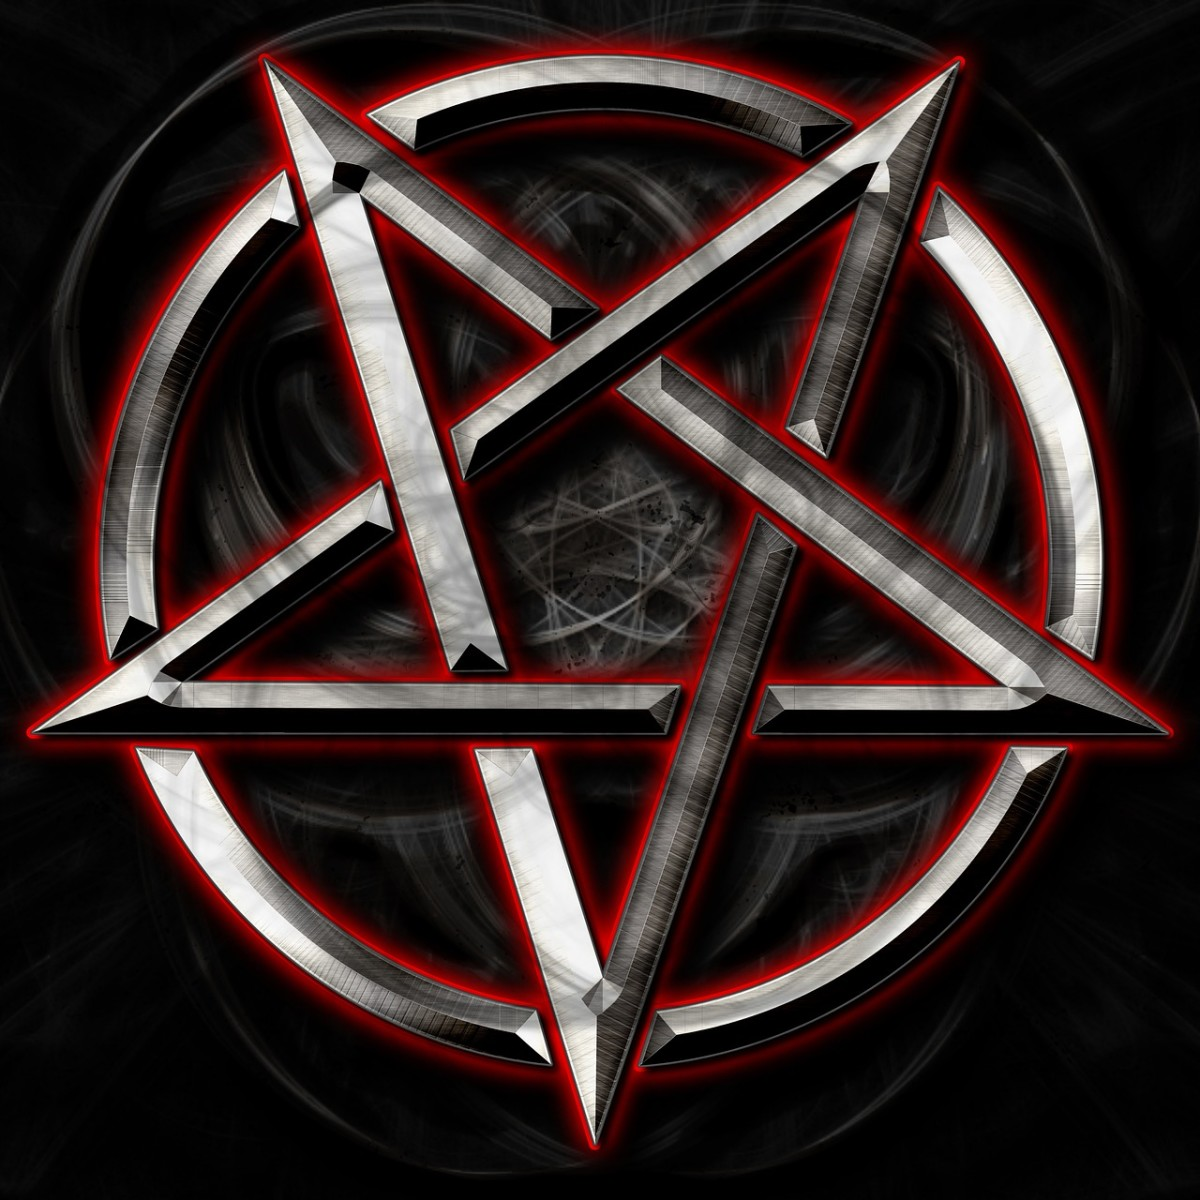 satanism-pedophilia-and-hell-earth